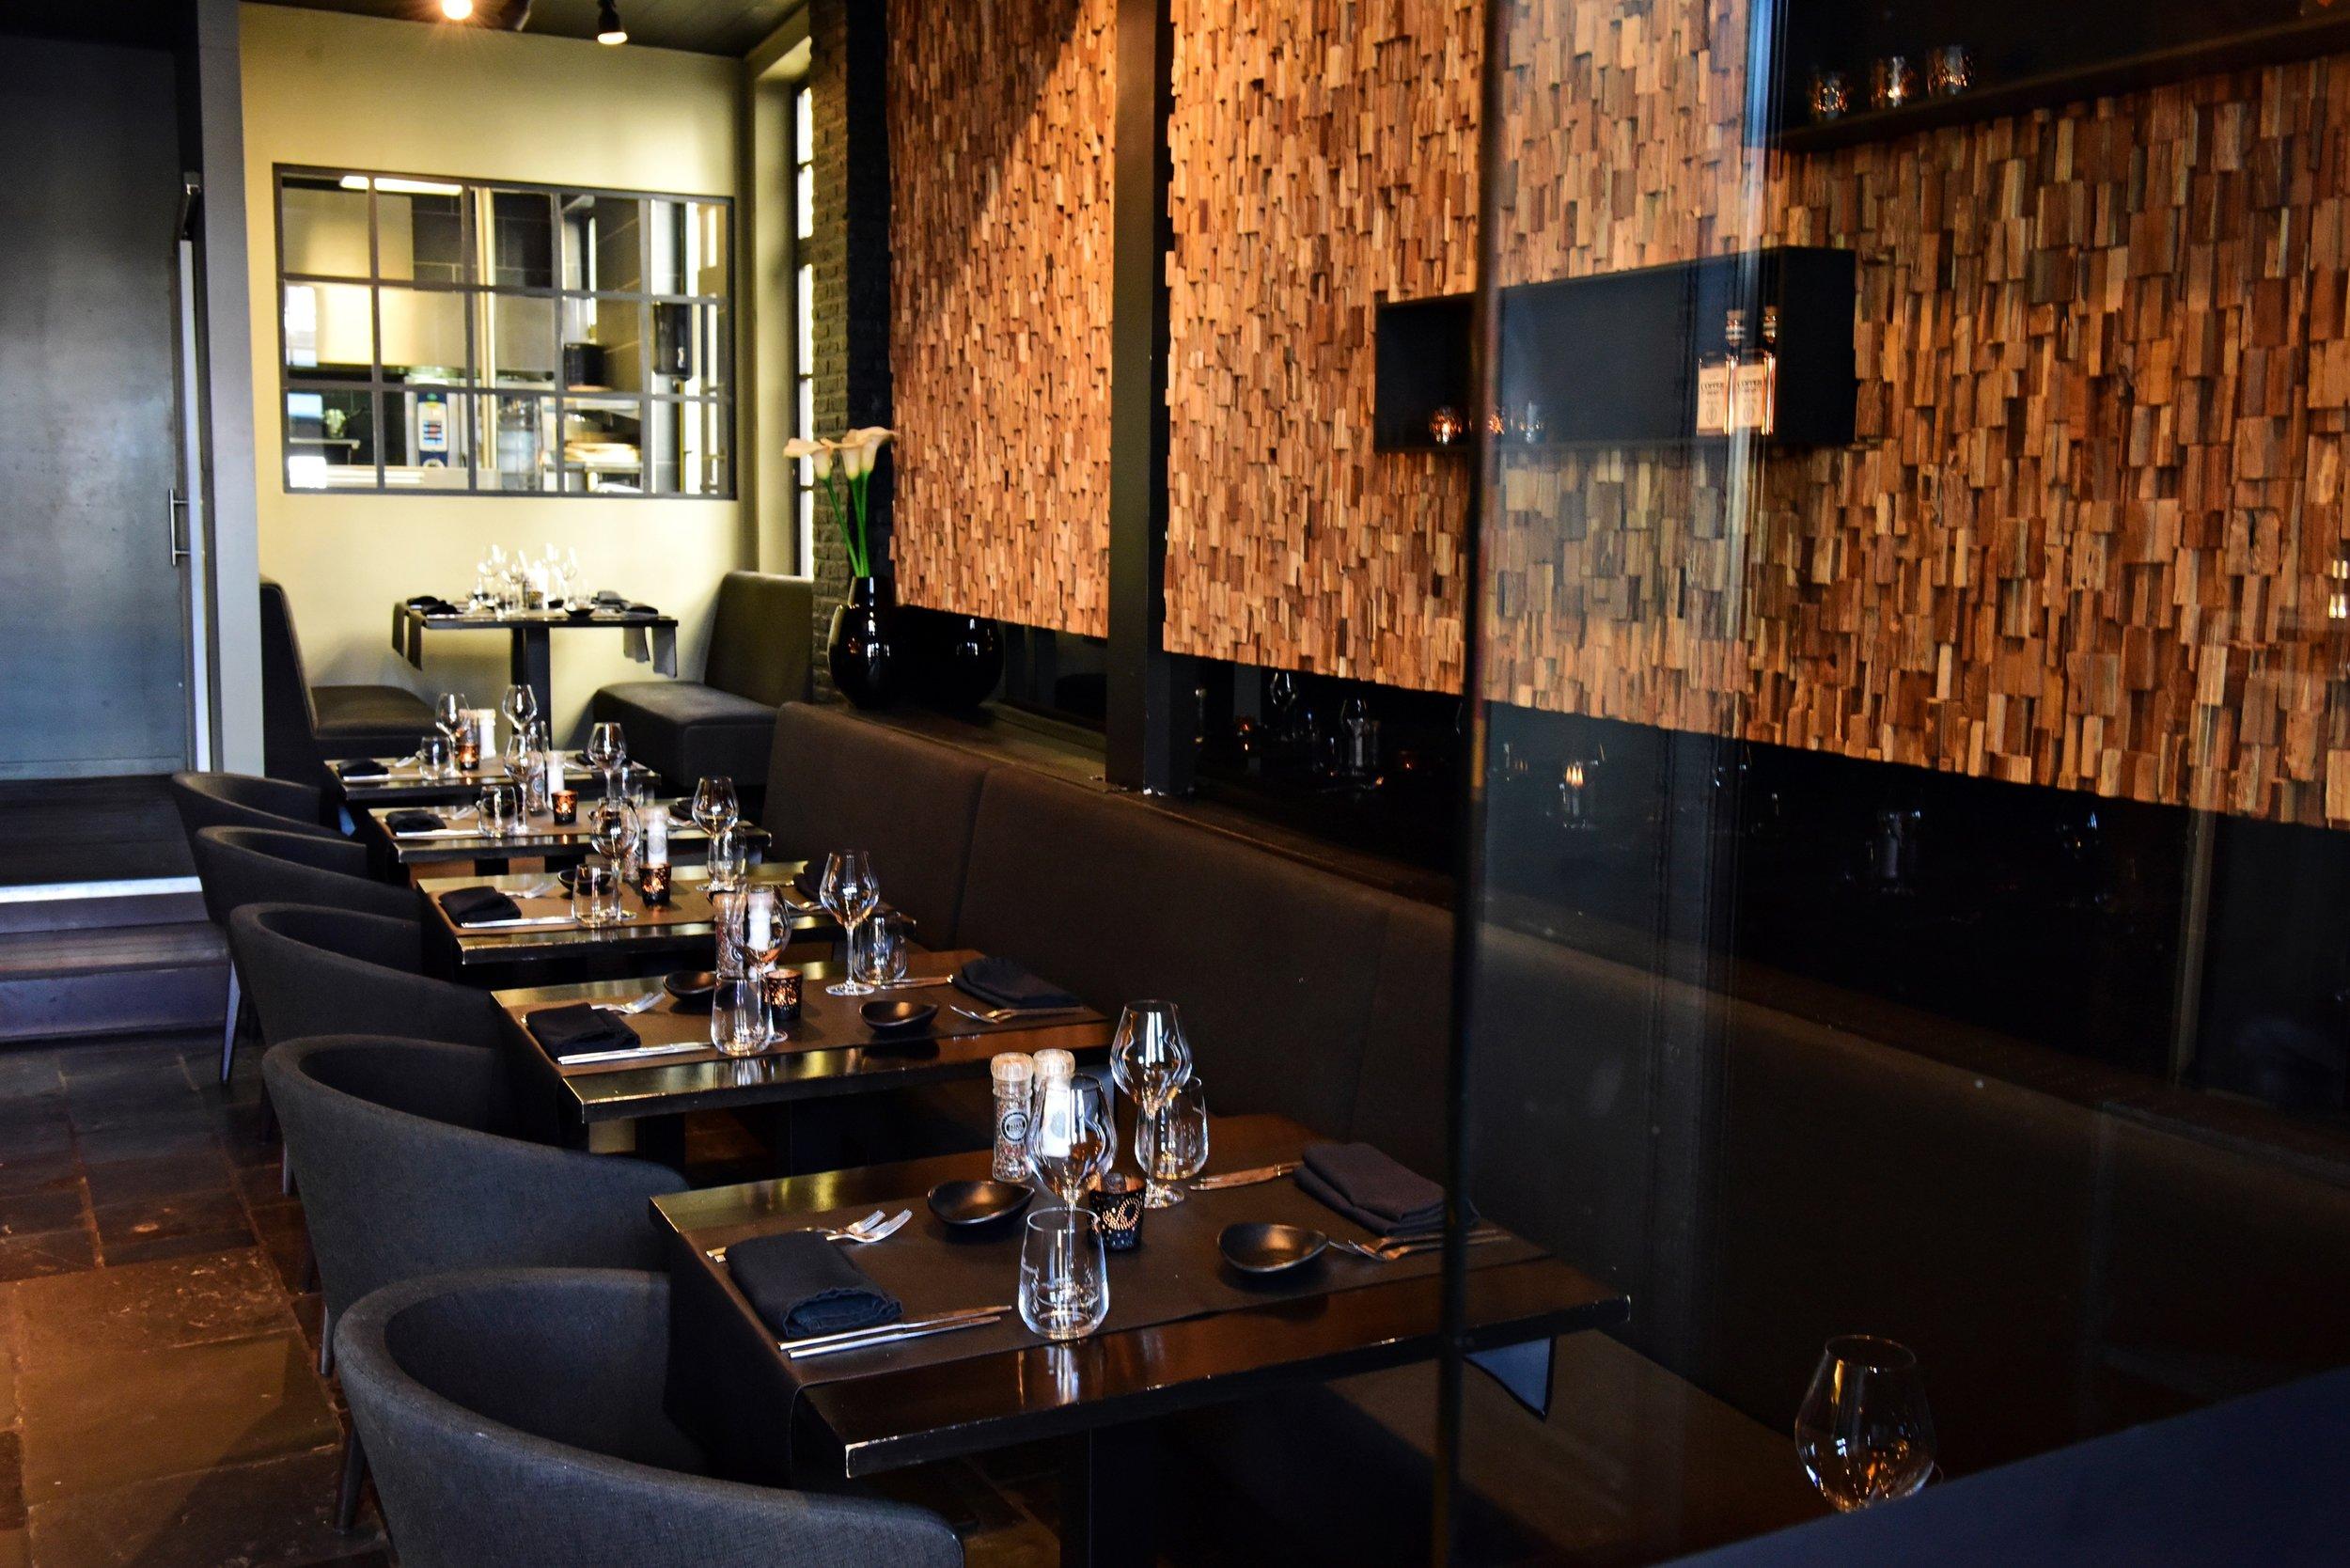 3 brasserie restaurant barleys barley's dendermonde grote markt bart albrecht tablefever.jpg